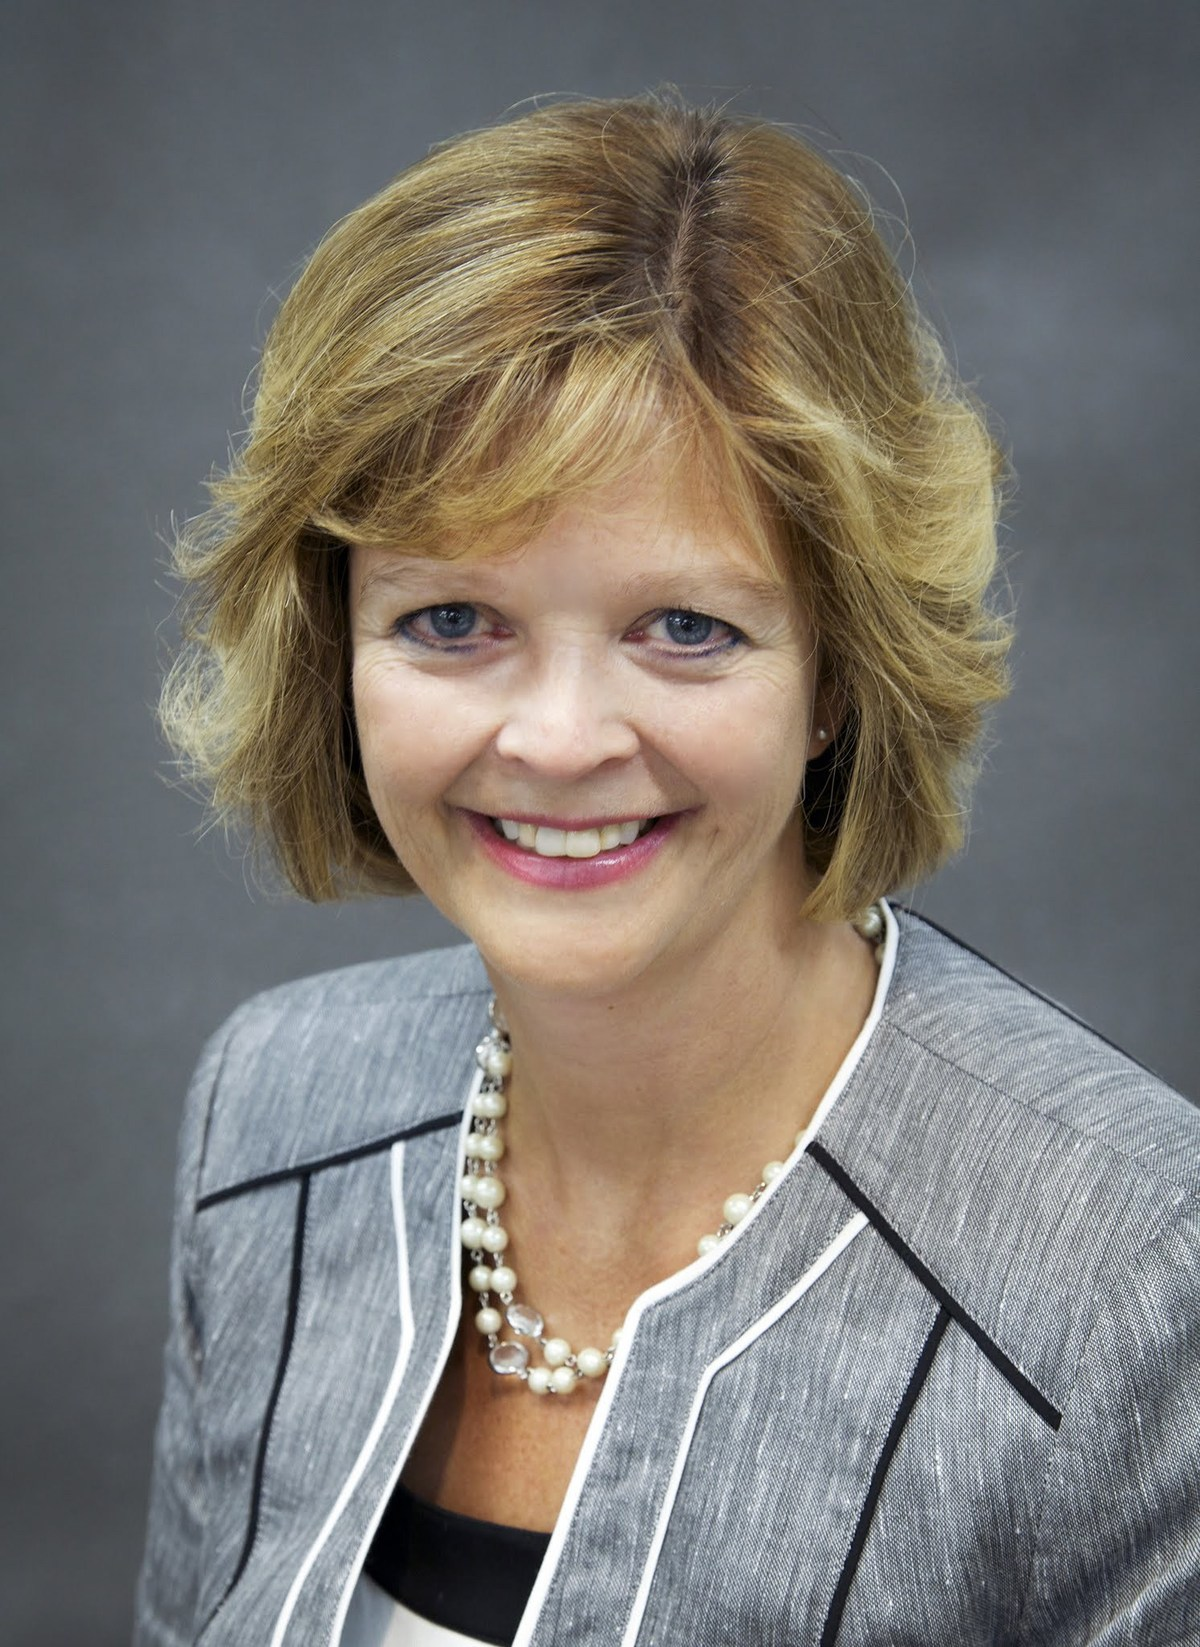 Joann Chambers, Superintendent